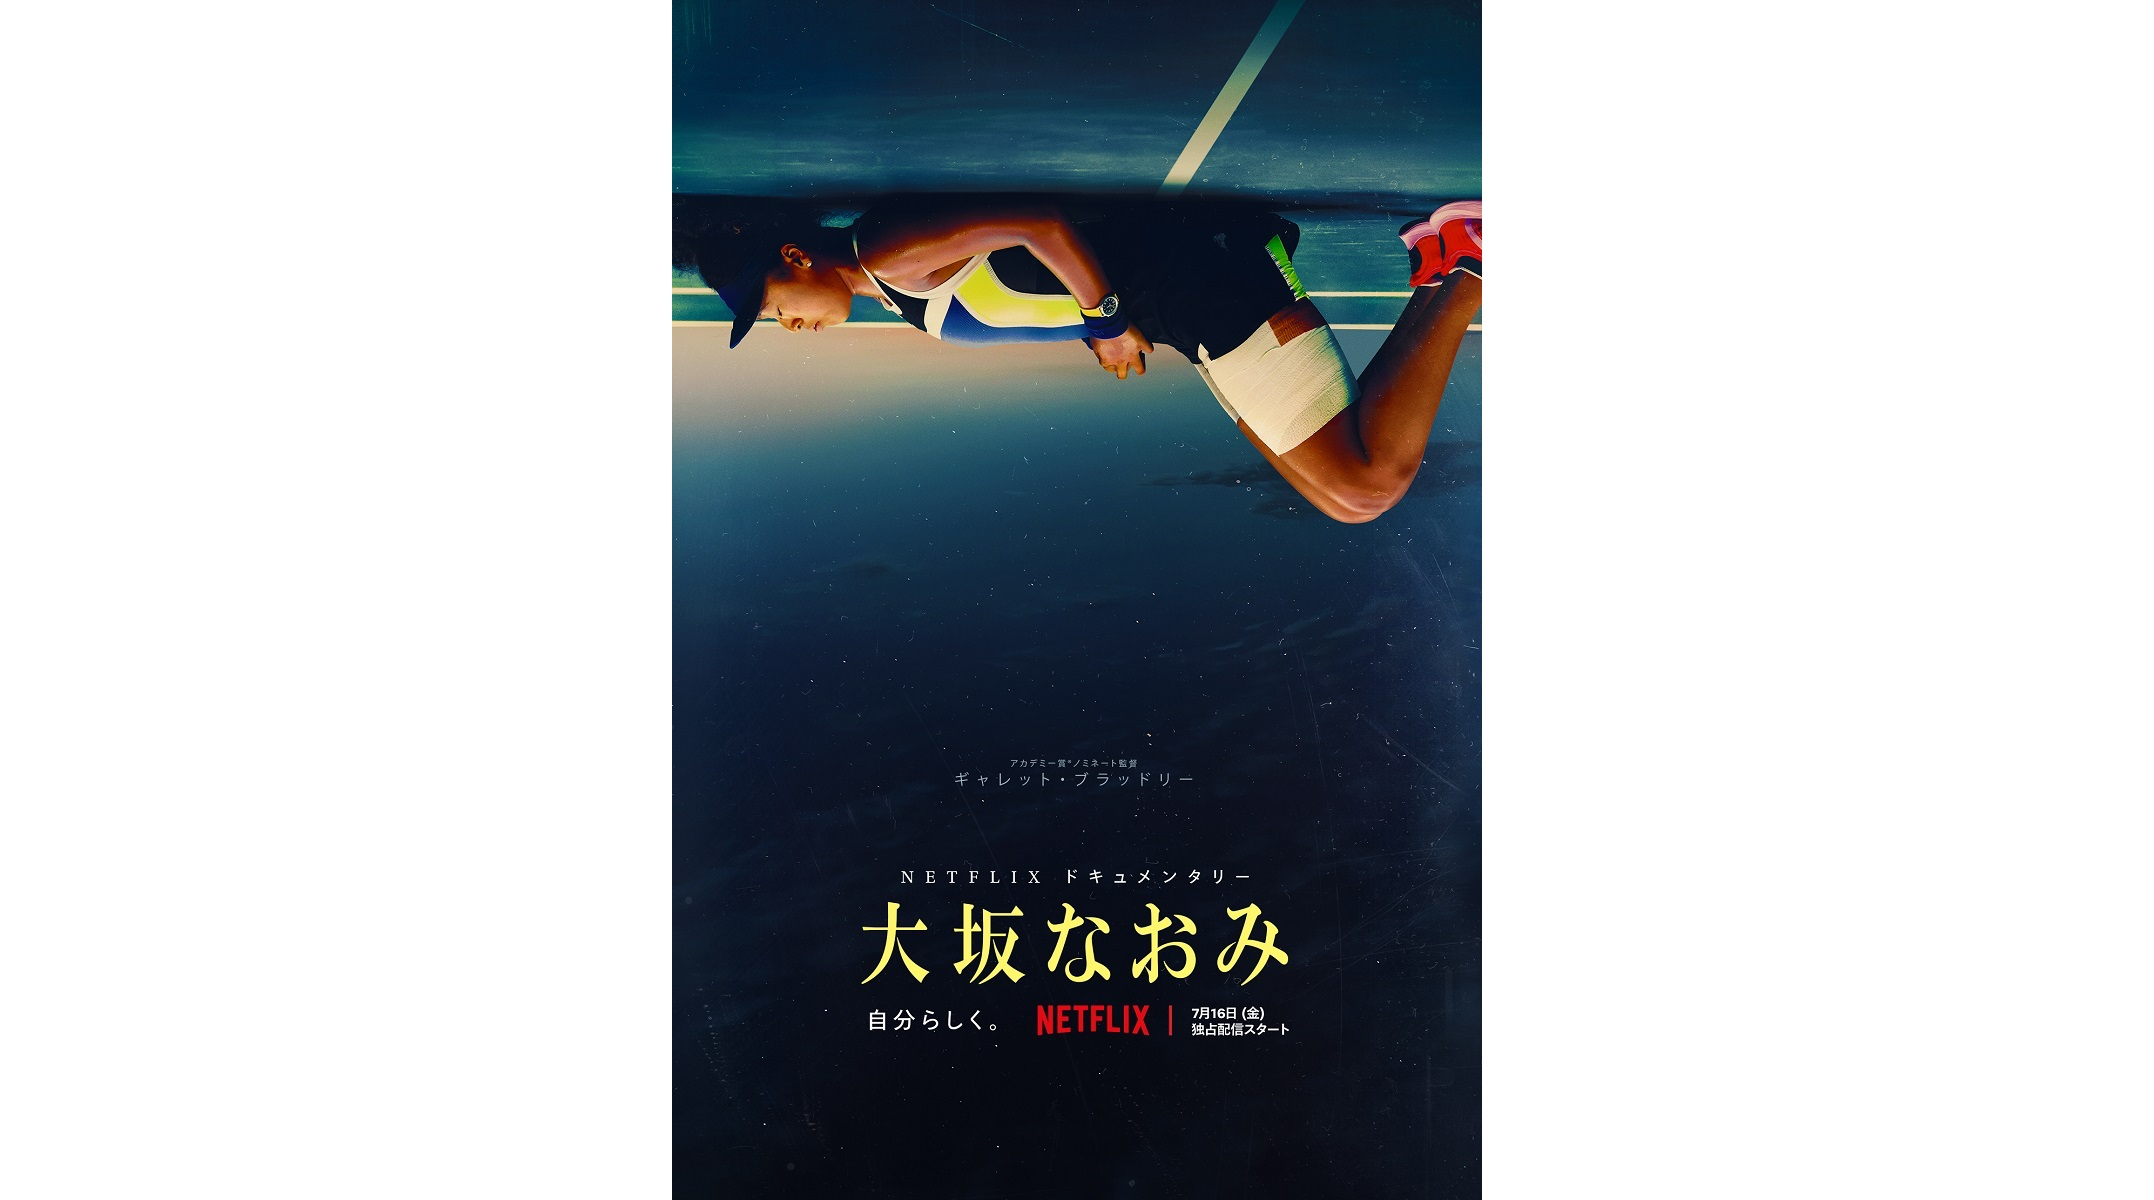 Netflix『大坂なおみ』:キービジュアル